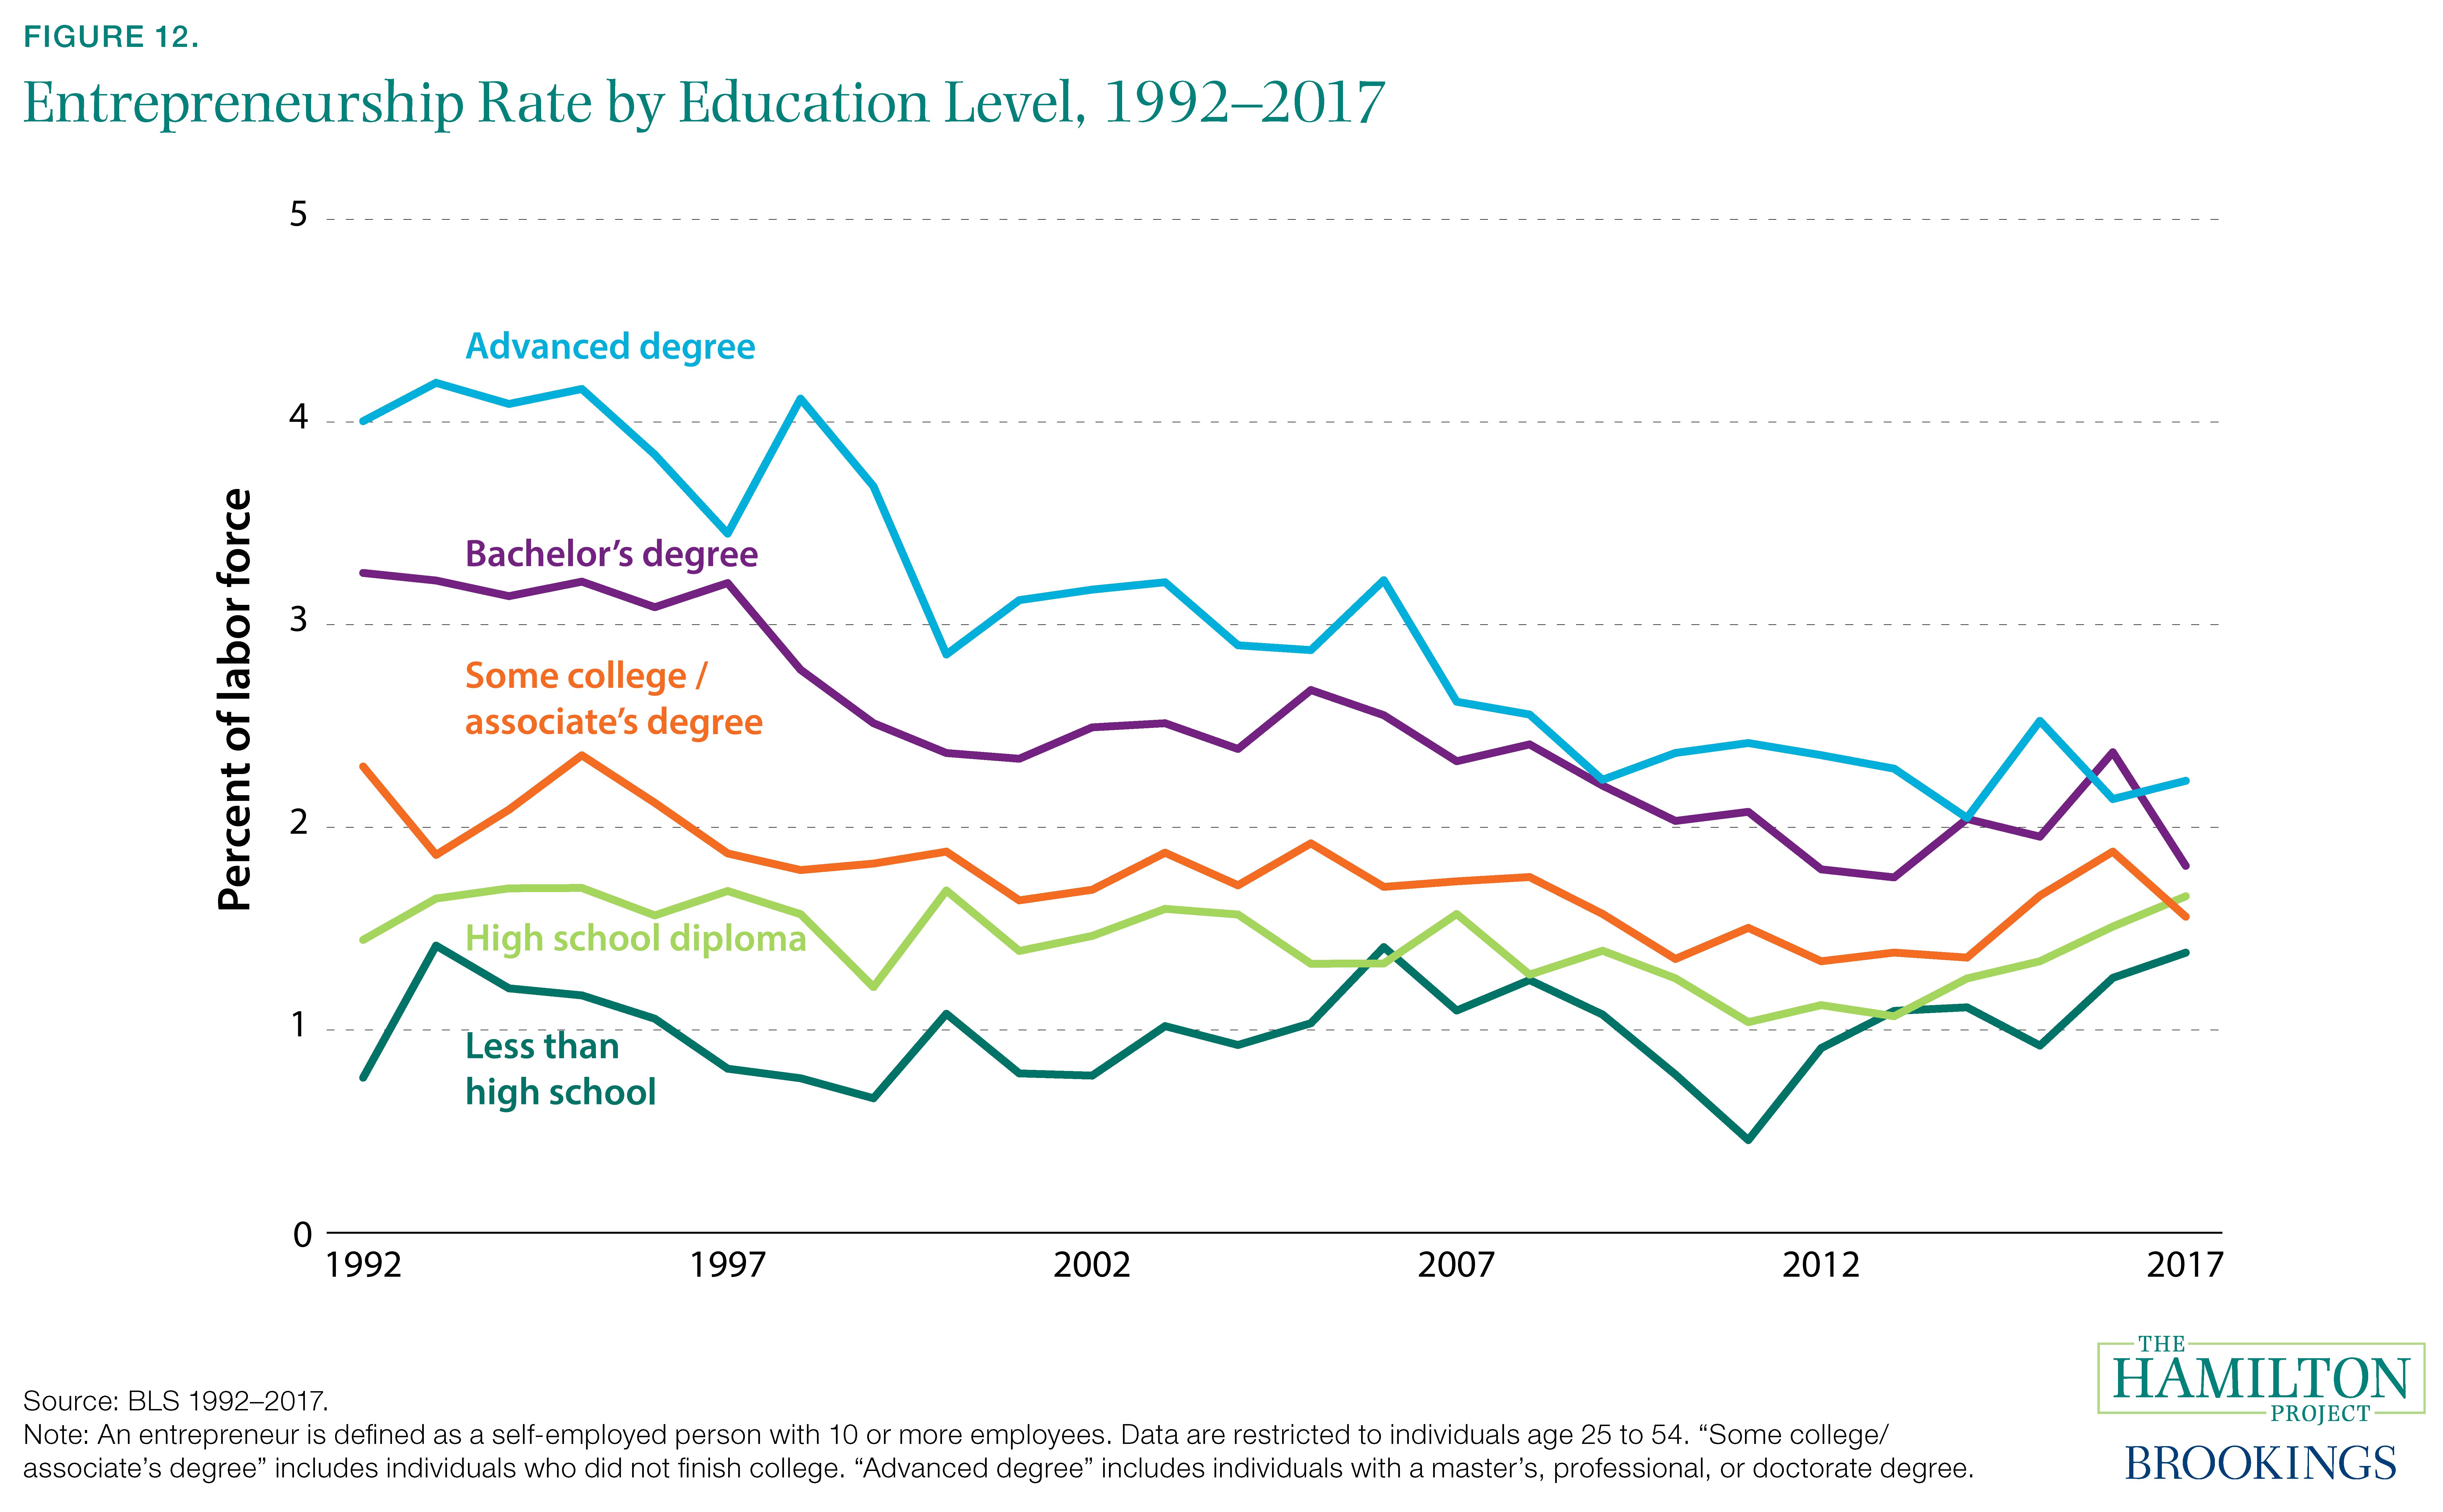 Figure 12. Entrepreneurship Rate by Education Level, 1992–2017